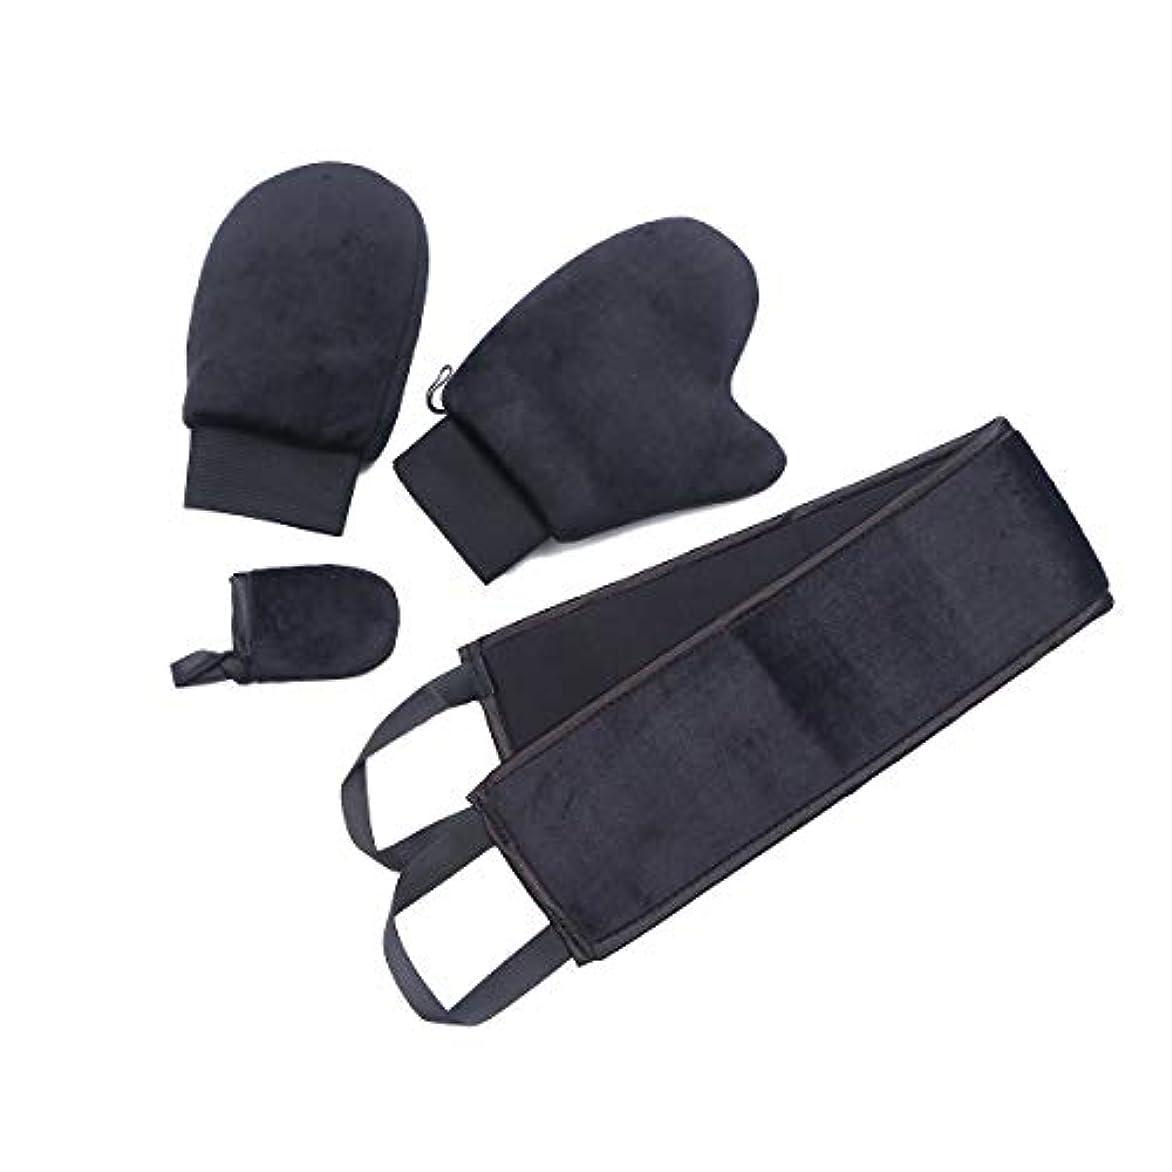 Healifty 4本化粧オイルSPAタンミットアプリケータサンレスタンニンググローブスーツ